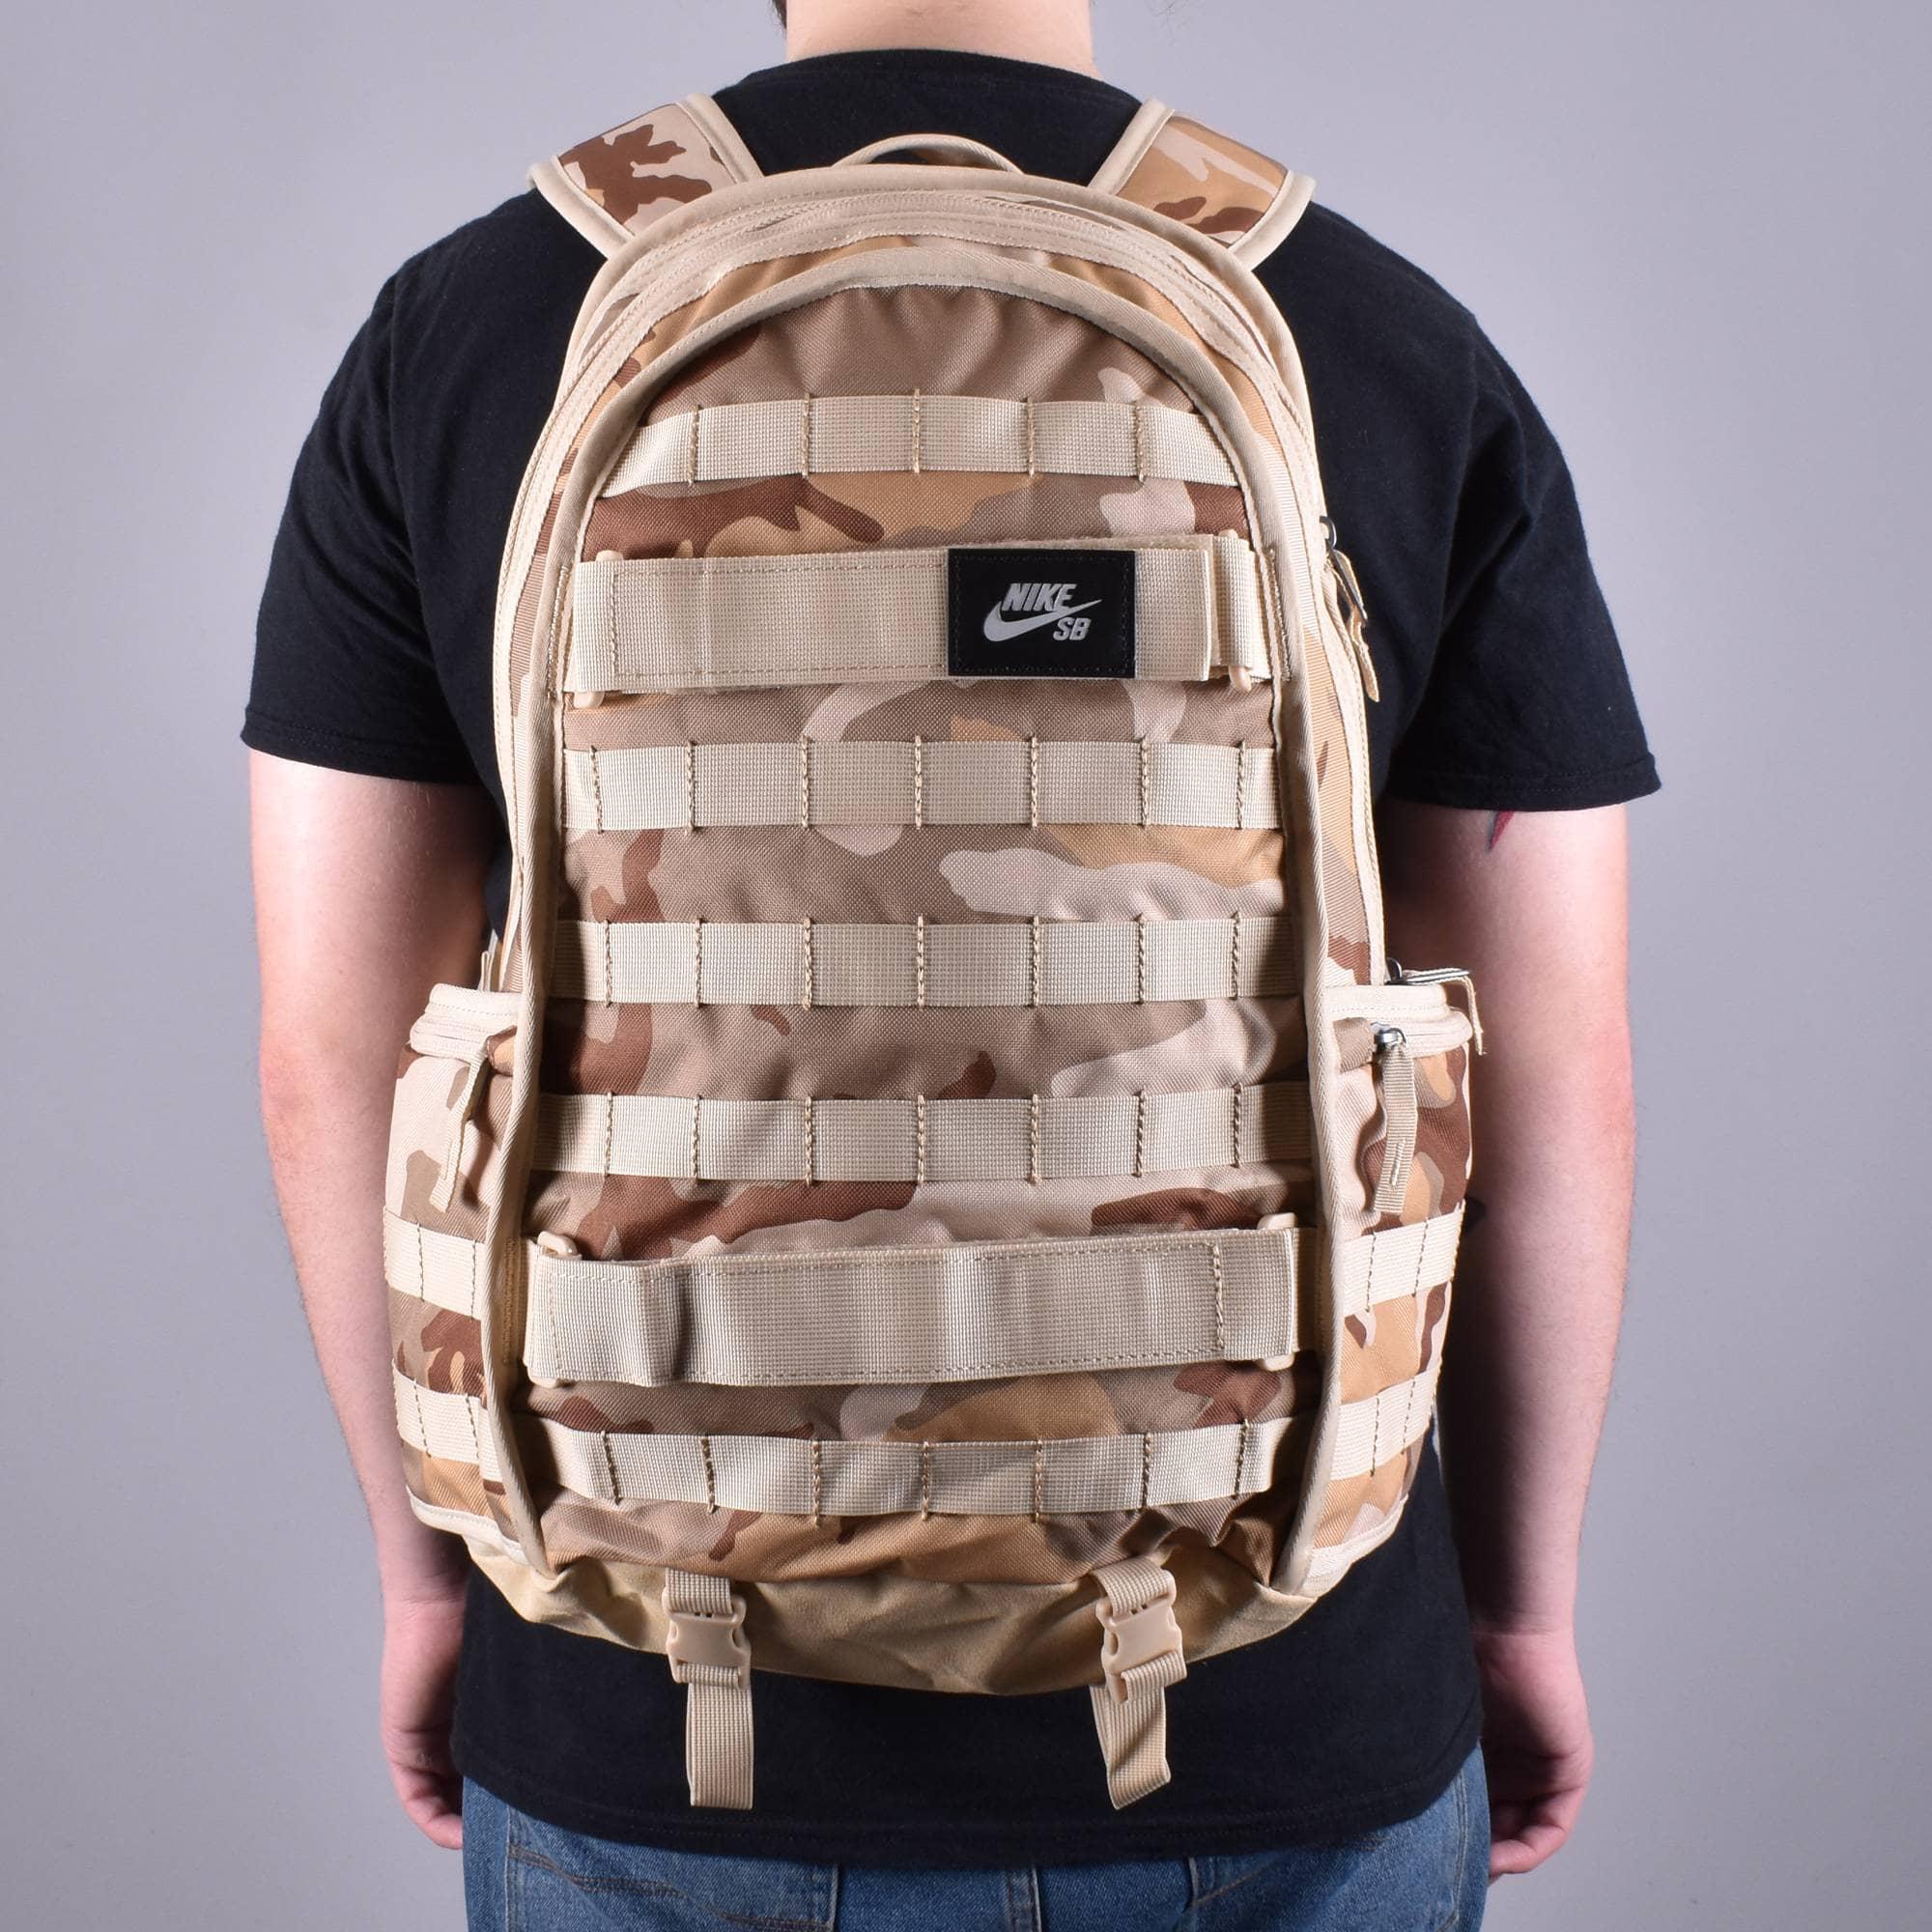 Invalidez Correspondiente a Además  Nike SB RPM Camo Skate Backpack - Desert Camo - ACCESSORIES from ...